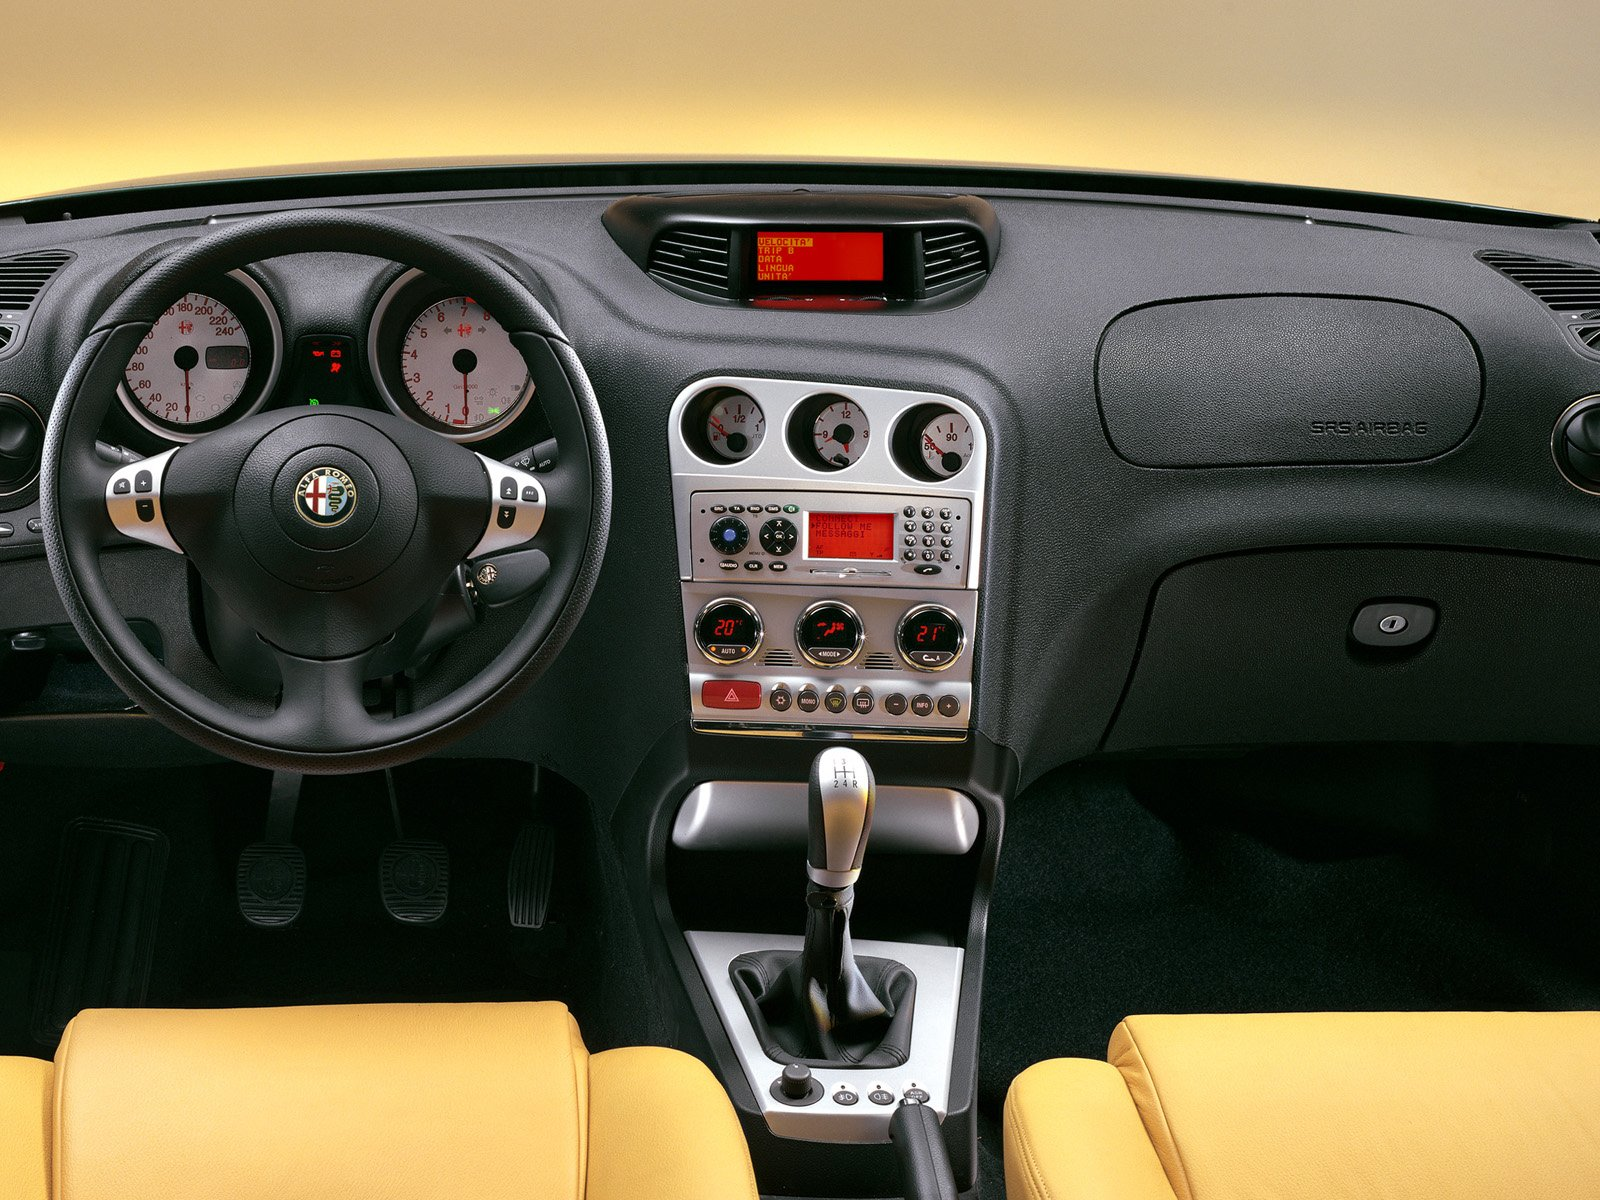 Alfa Romeo 156 I Restyling 2 2003 - 2007 Station wagon 5 door #8